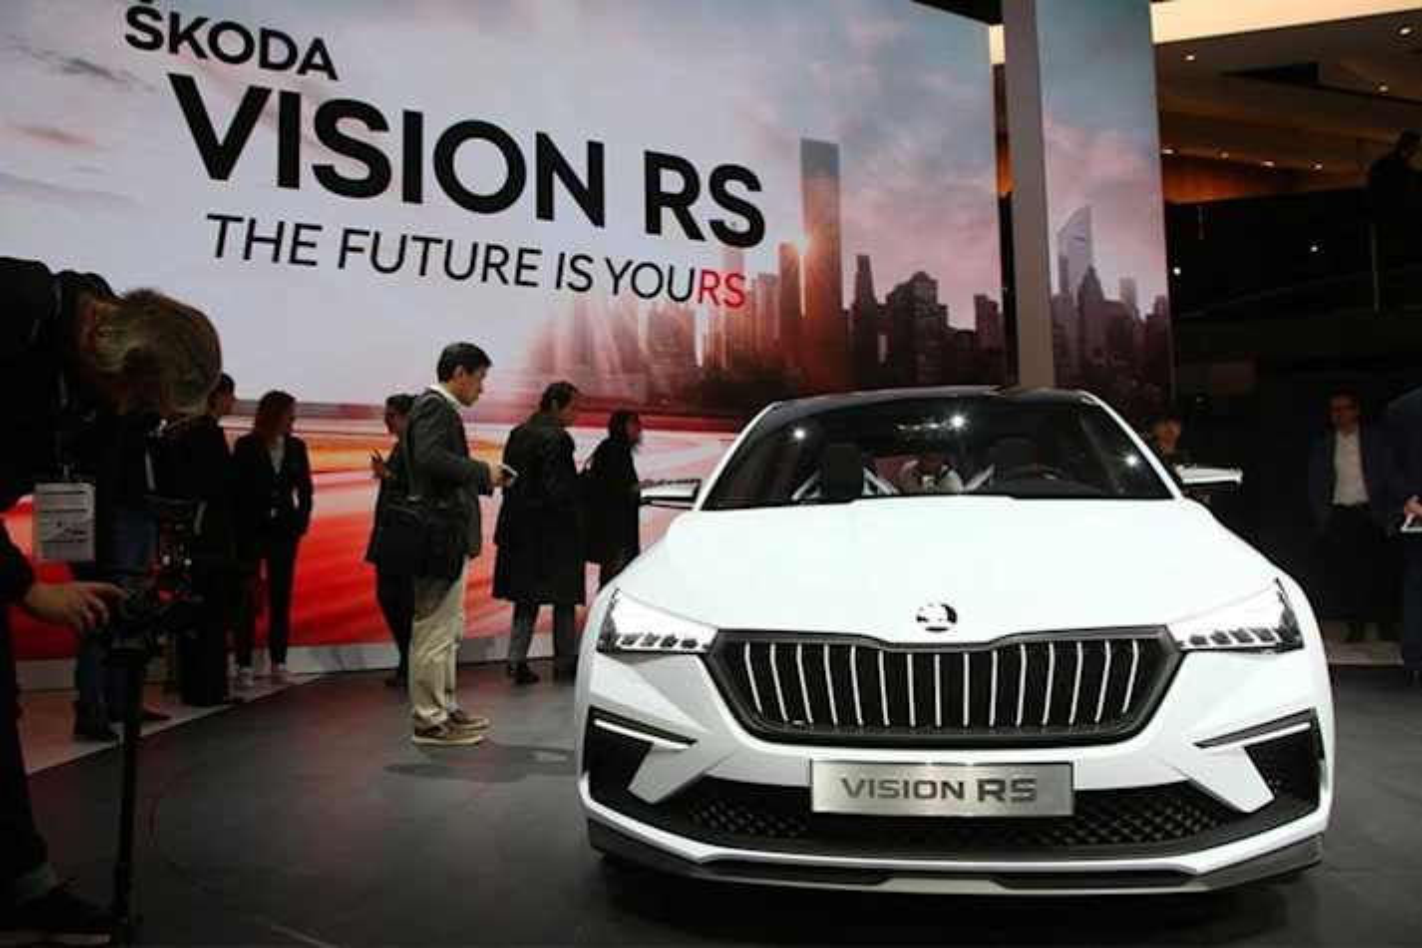 Skoda Vision RS Concept Rapid Replacement 2018 Paris Motor Show Jpg